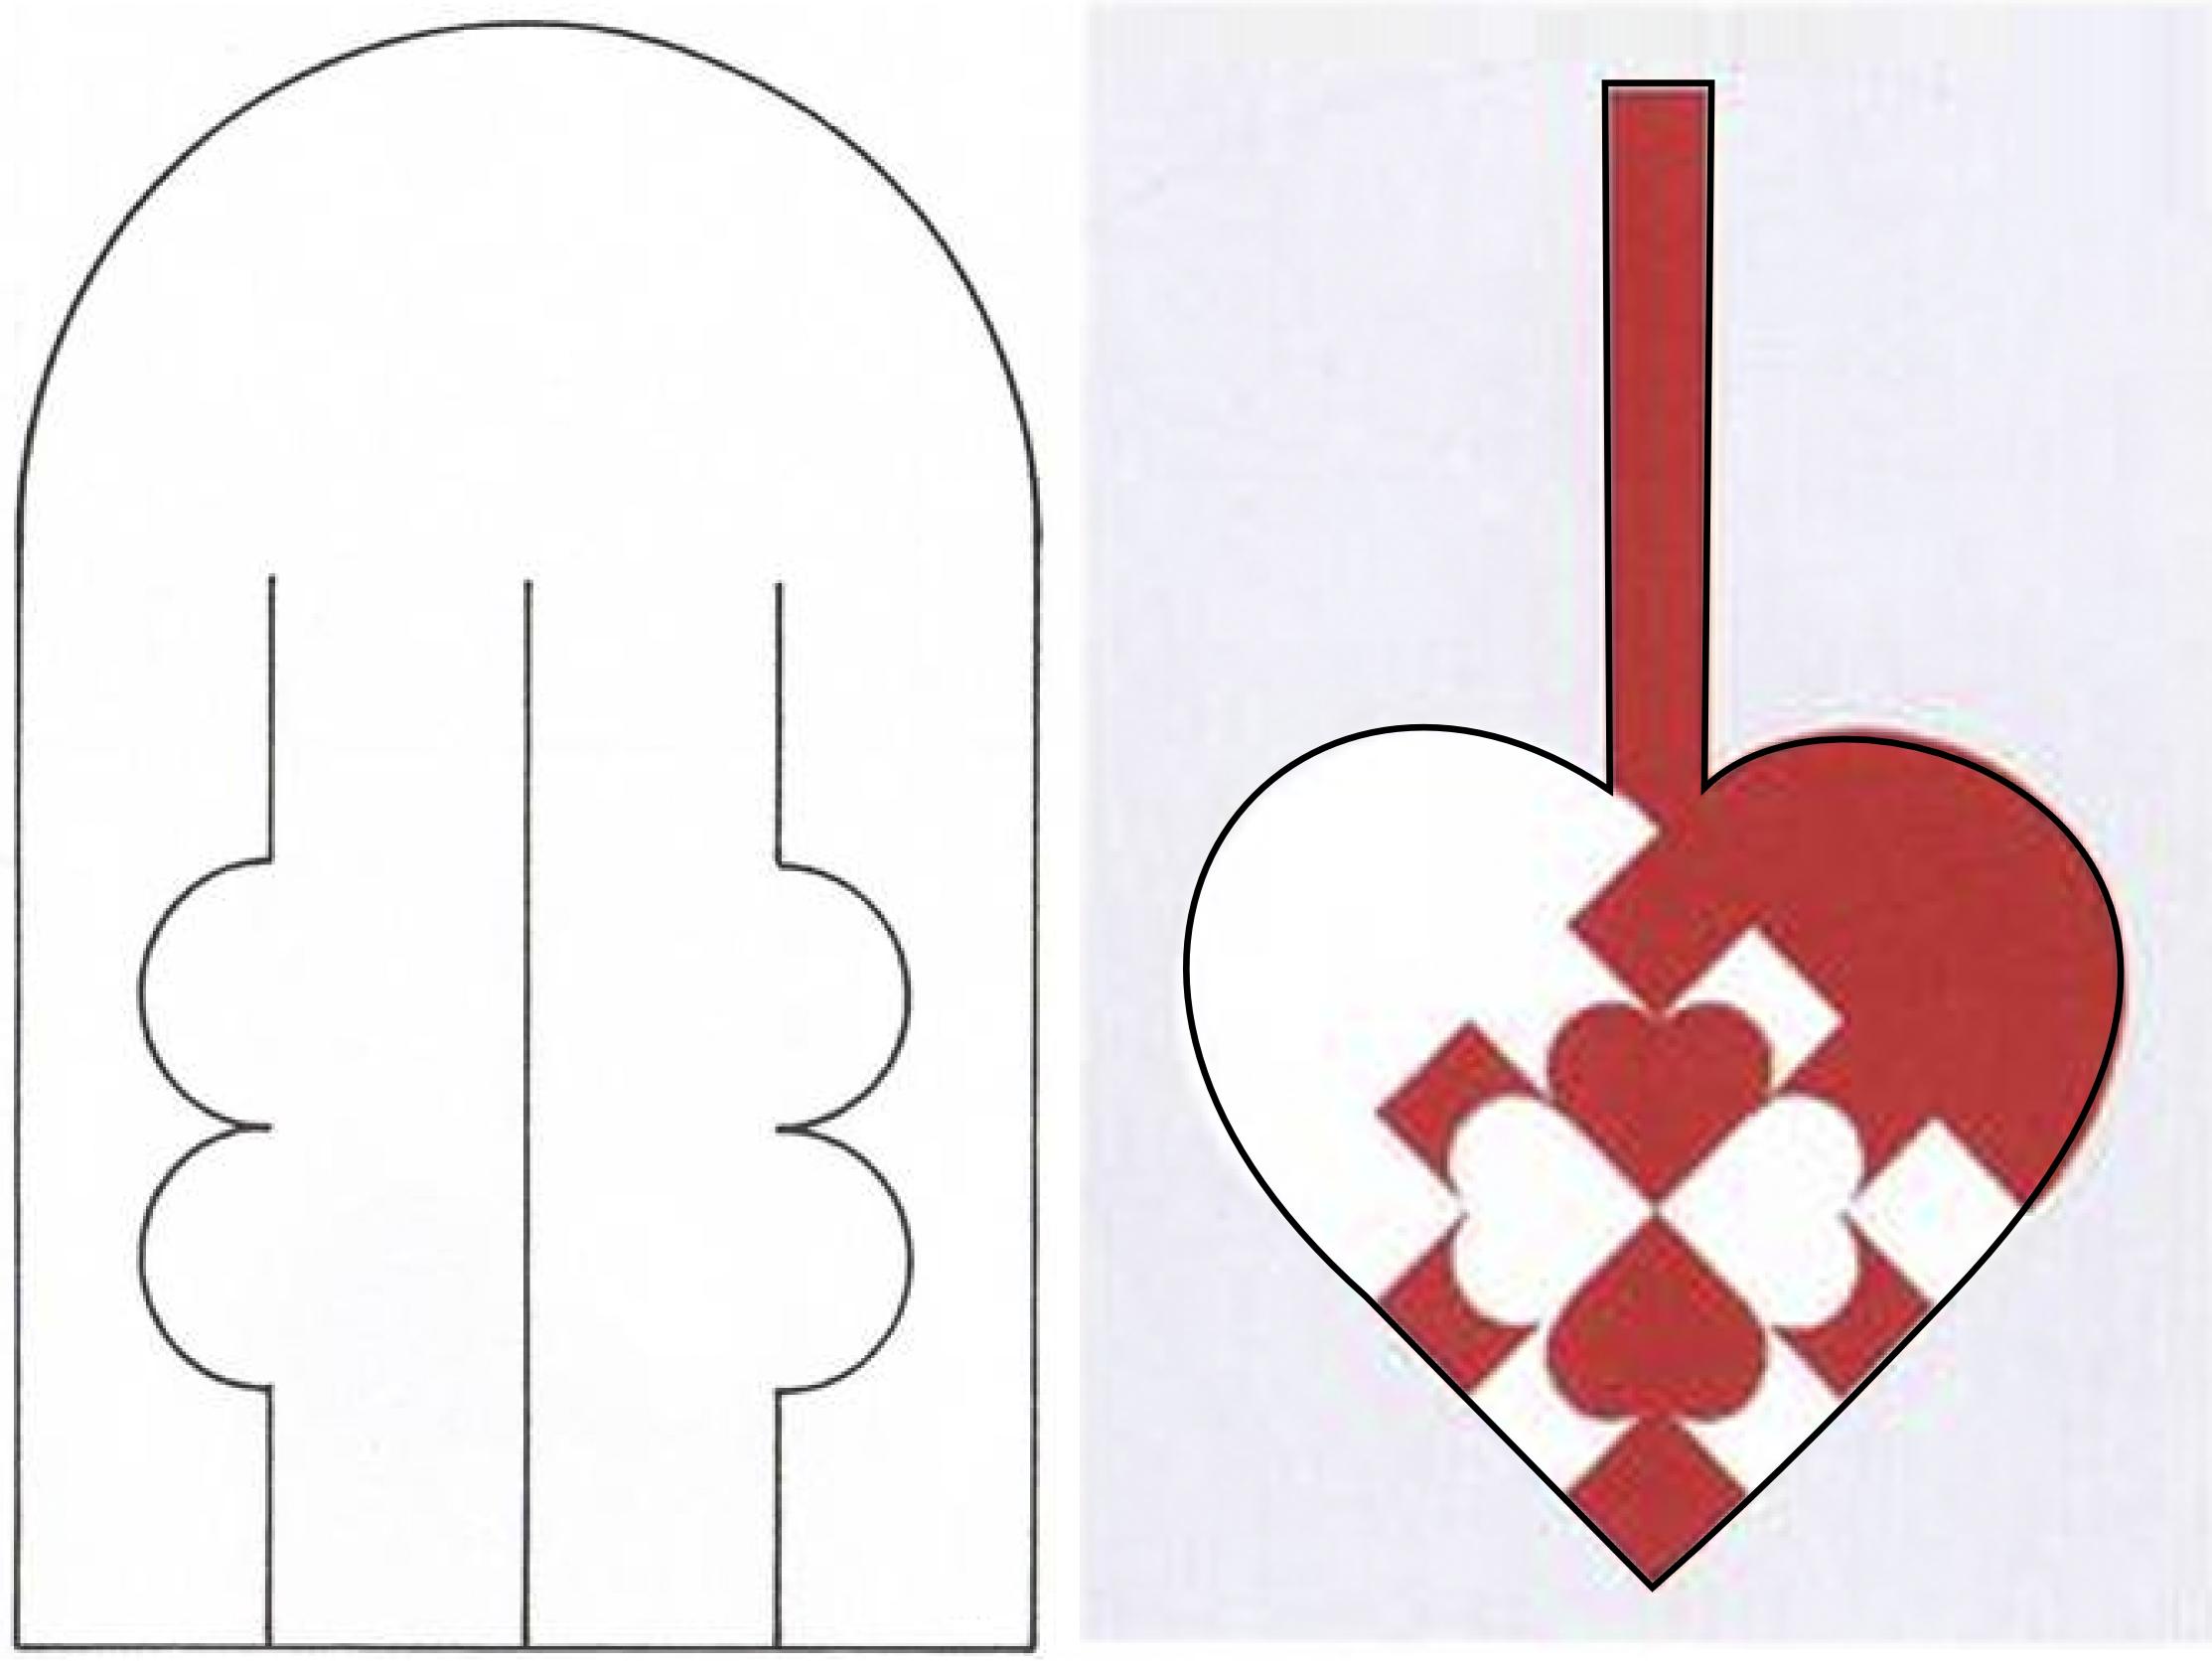 corazón - Actividades Lúdicas Educativas | enamorados | Pinterest ...